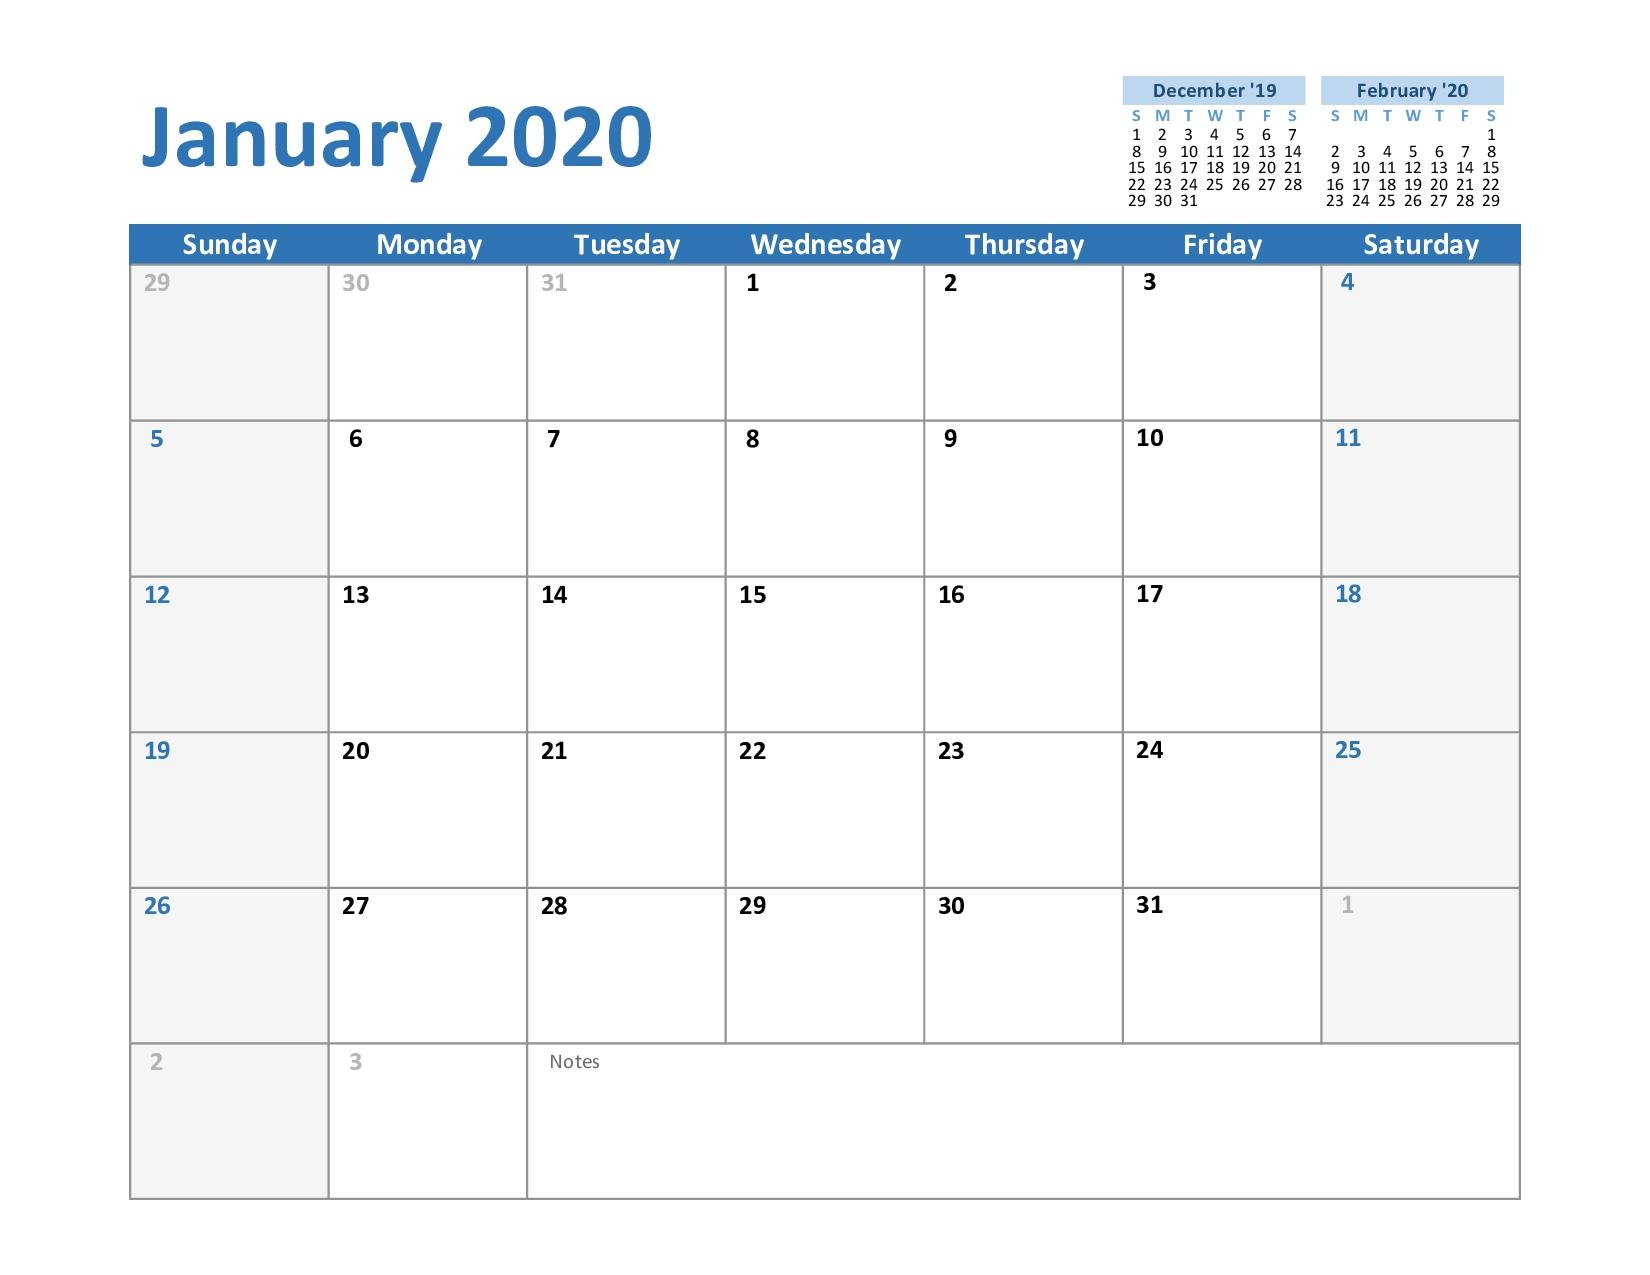 Free January Calendar 2020 Printable Template Blank In Pdf-2020 2 Page Monthly Calendar Printable Pdf